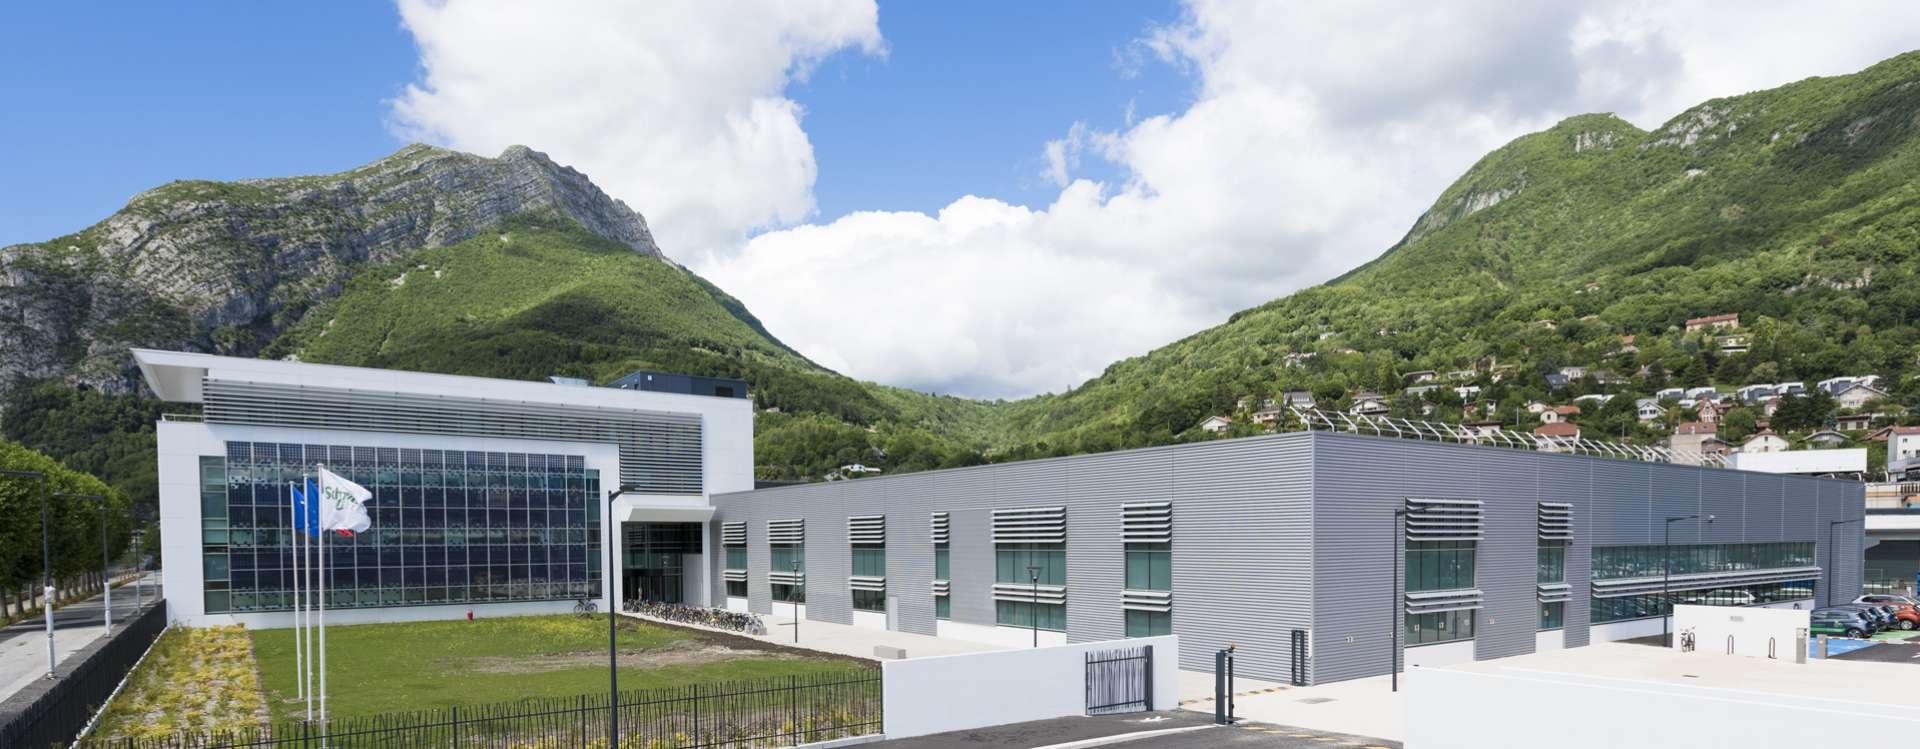 The Technopôle in Grenoble, GA business real estate, serving Schneider Electric